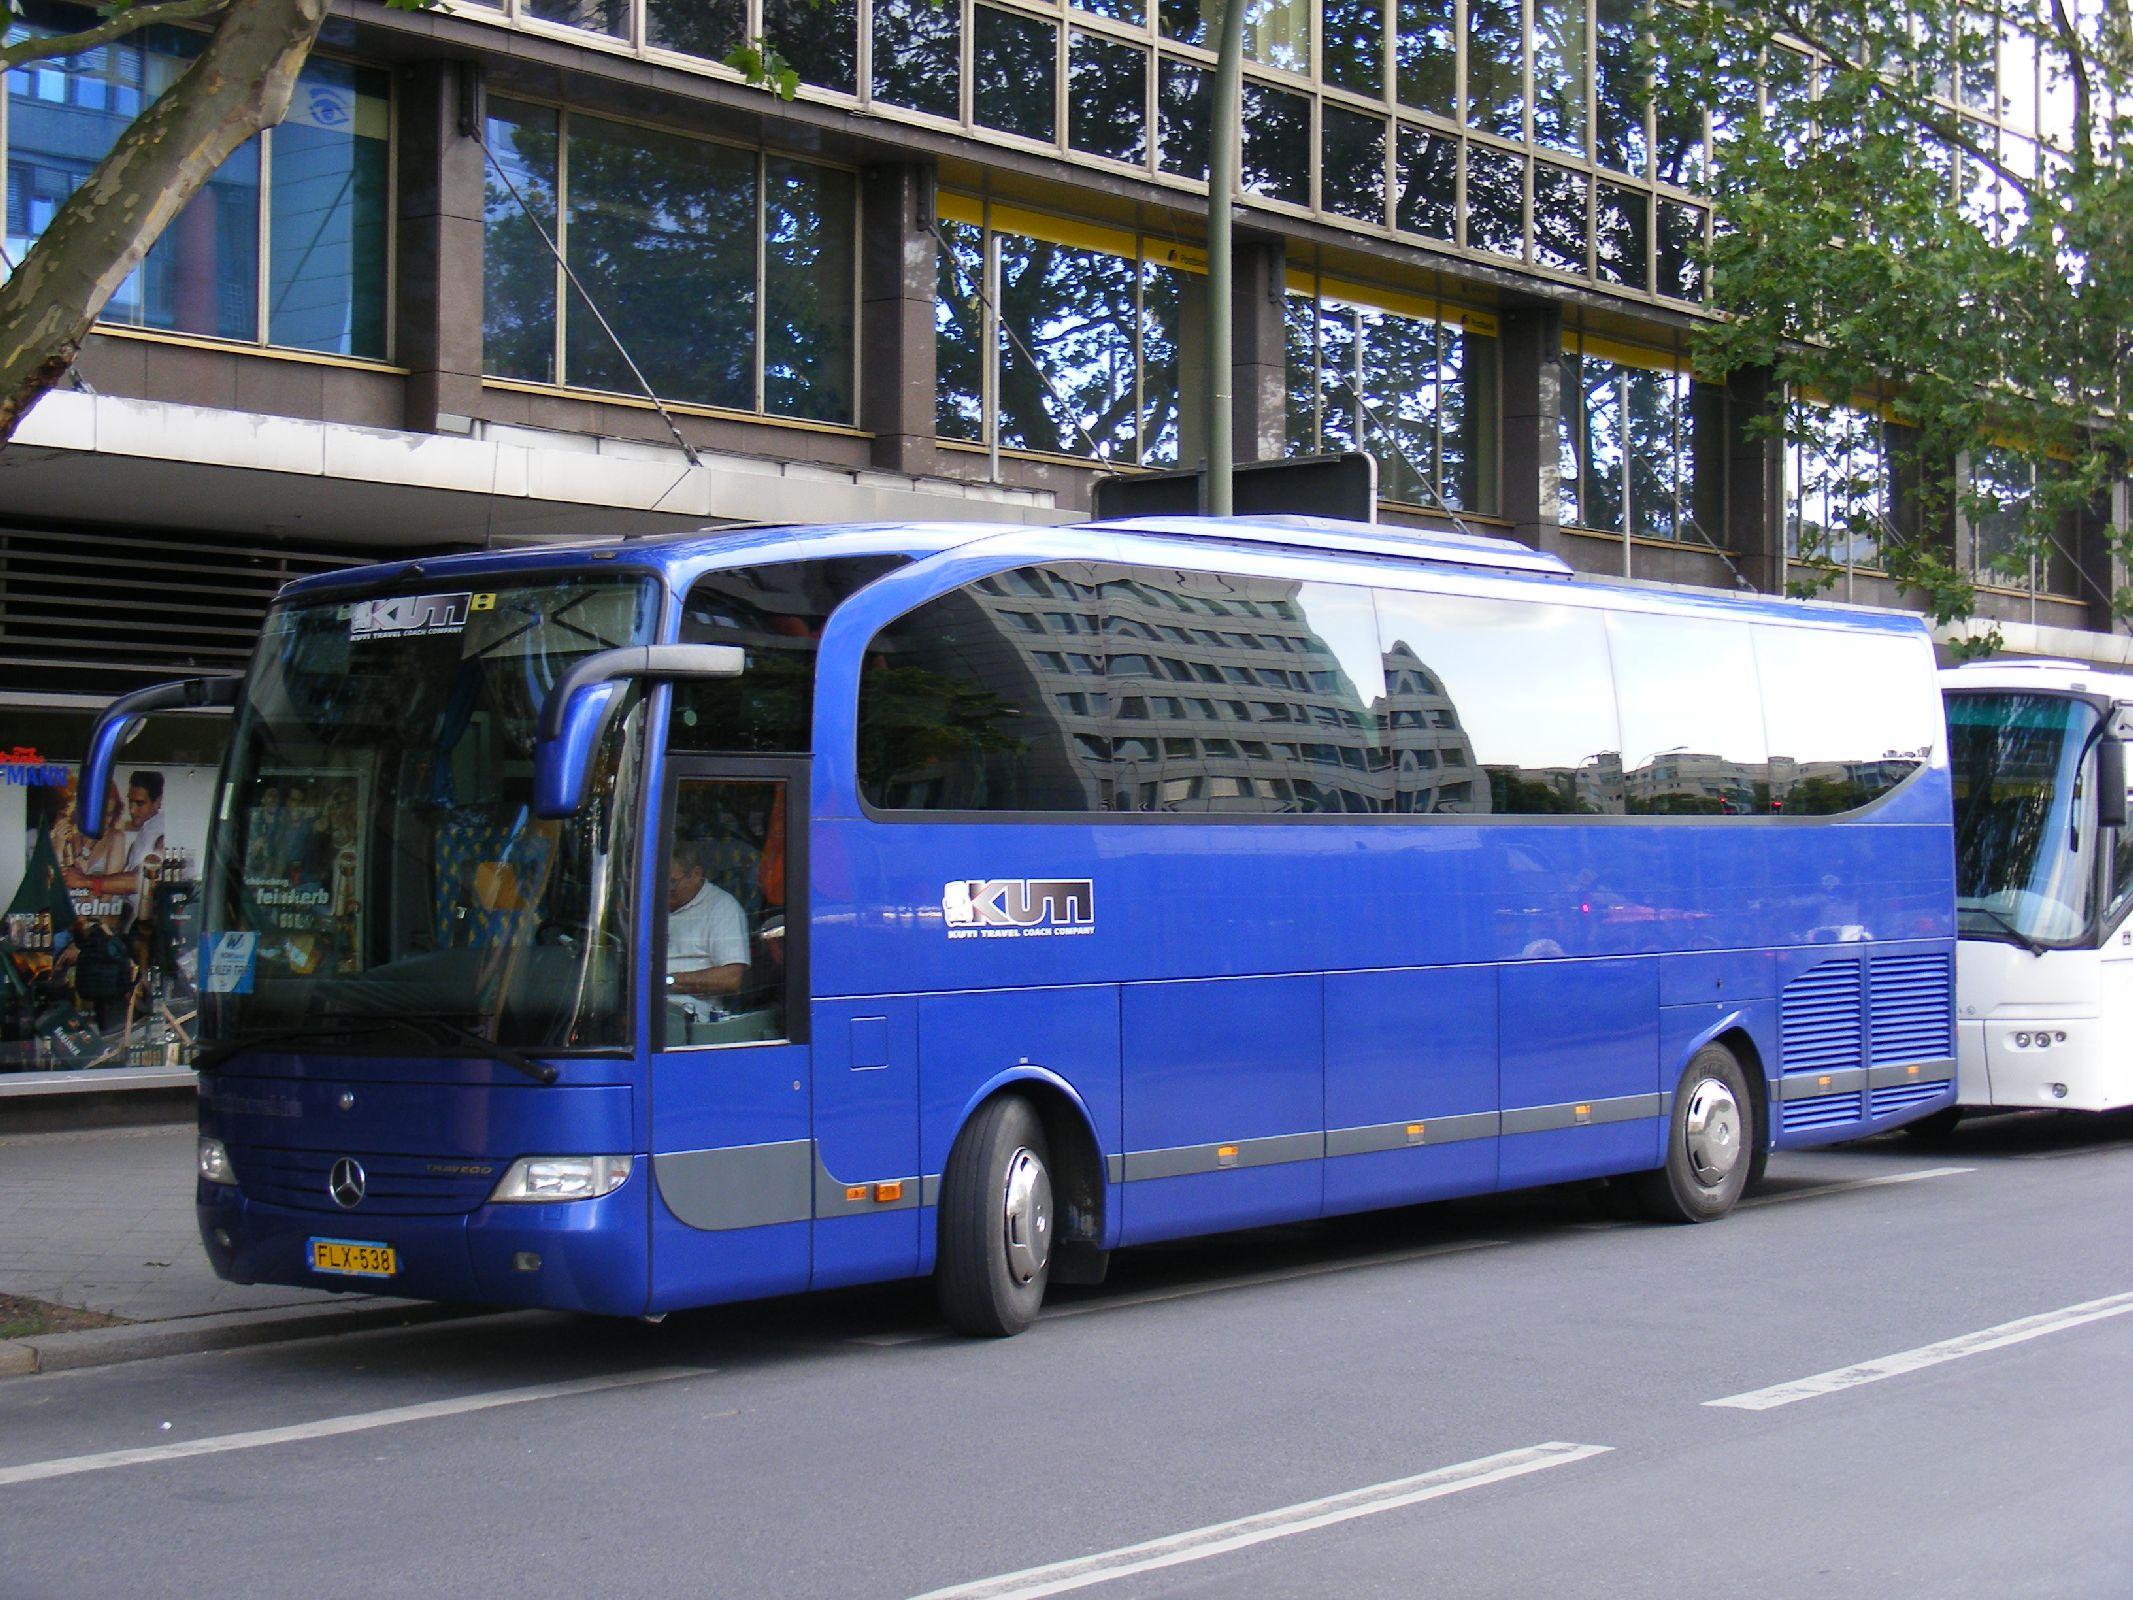 File:FLX-538, Mercedes Benz Travego, Kuti travel, Budapest ...